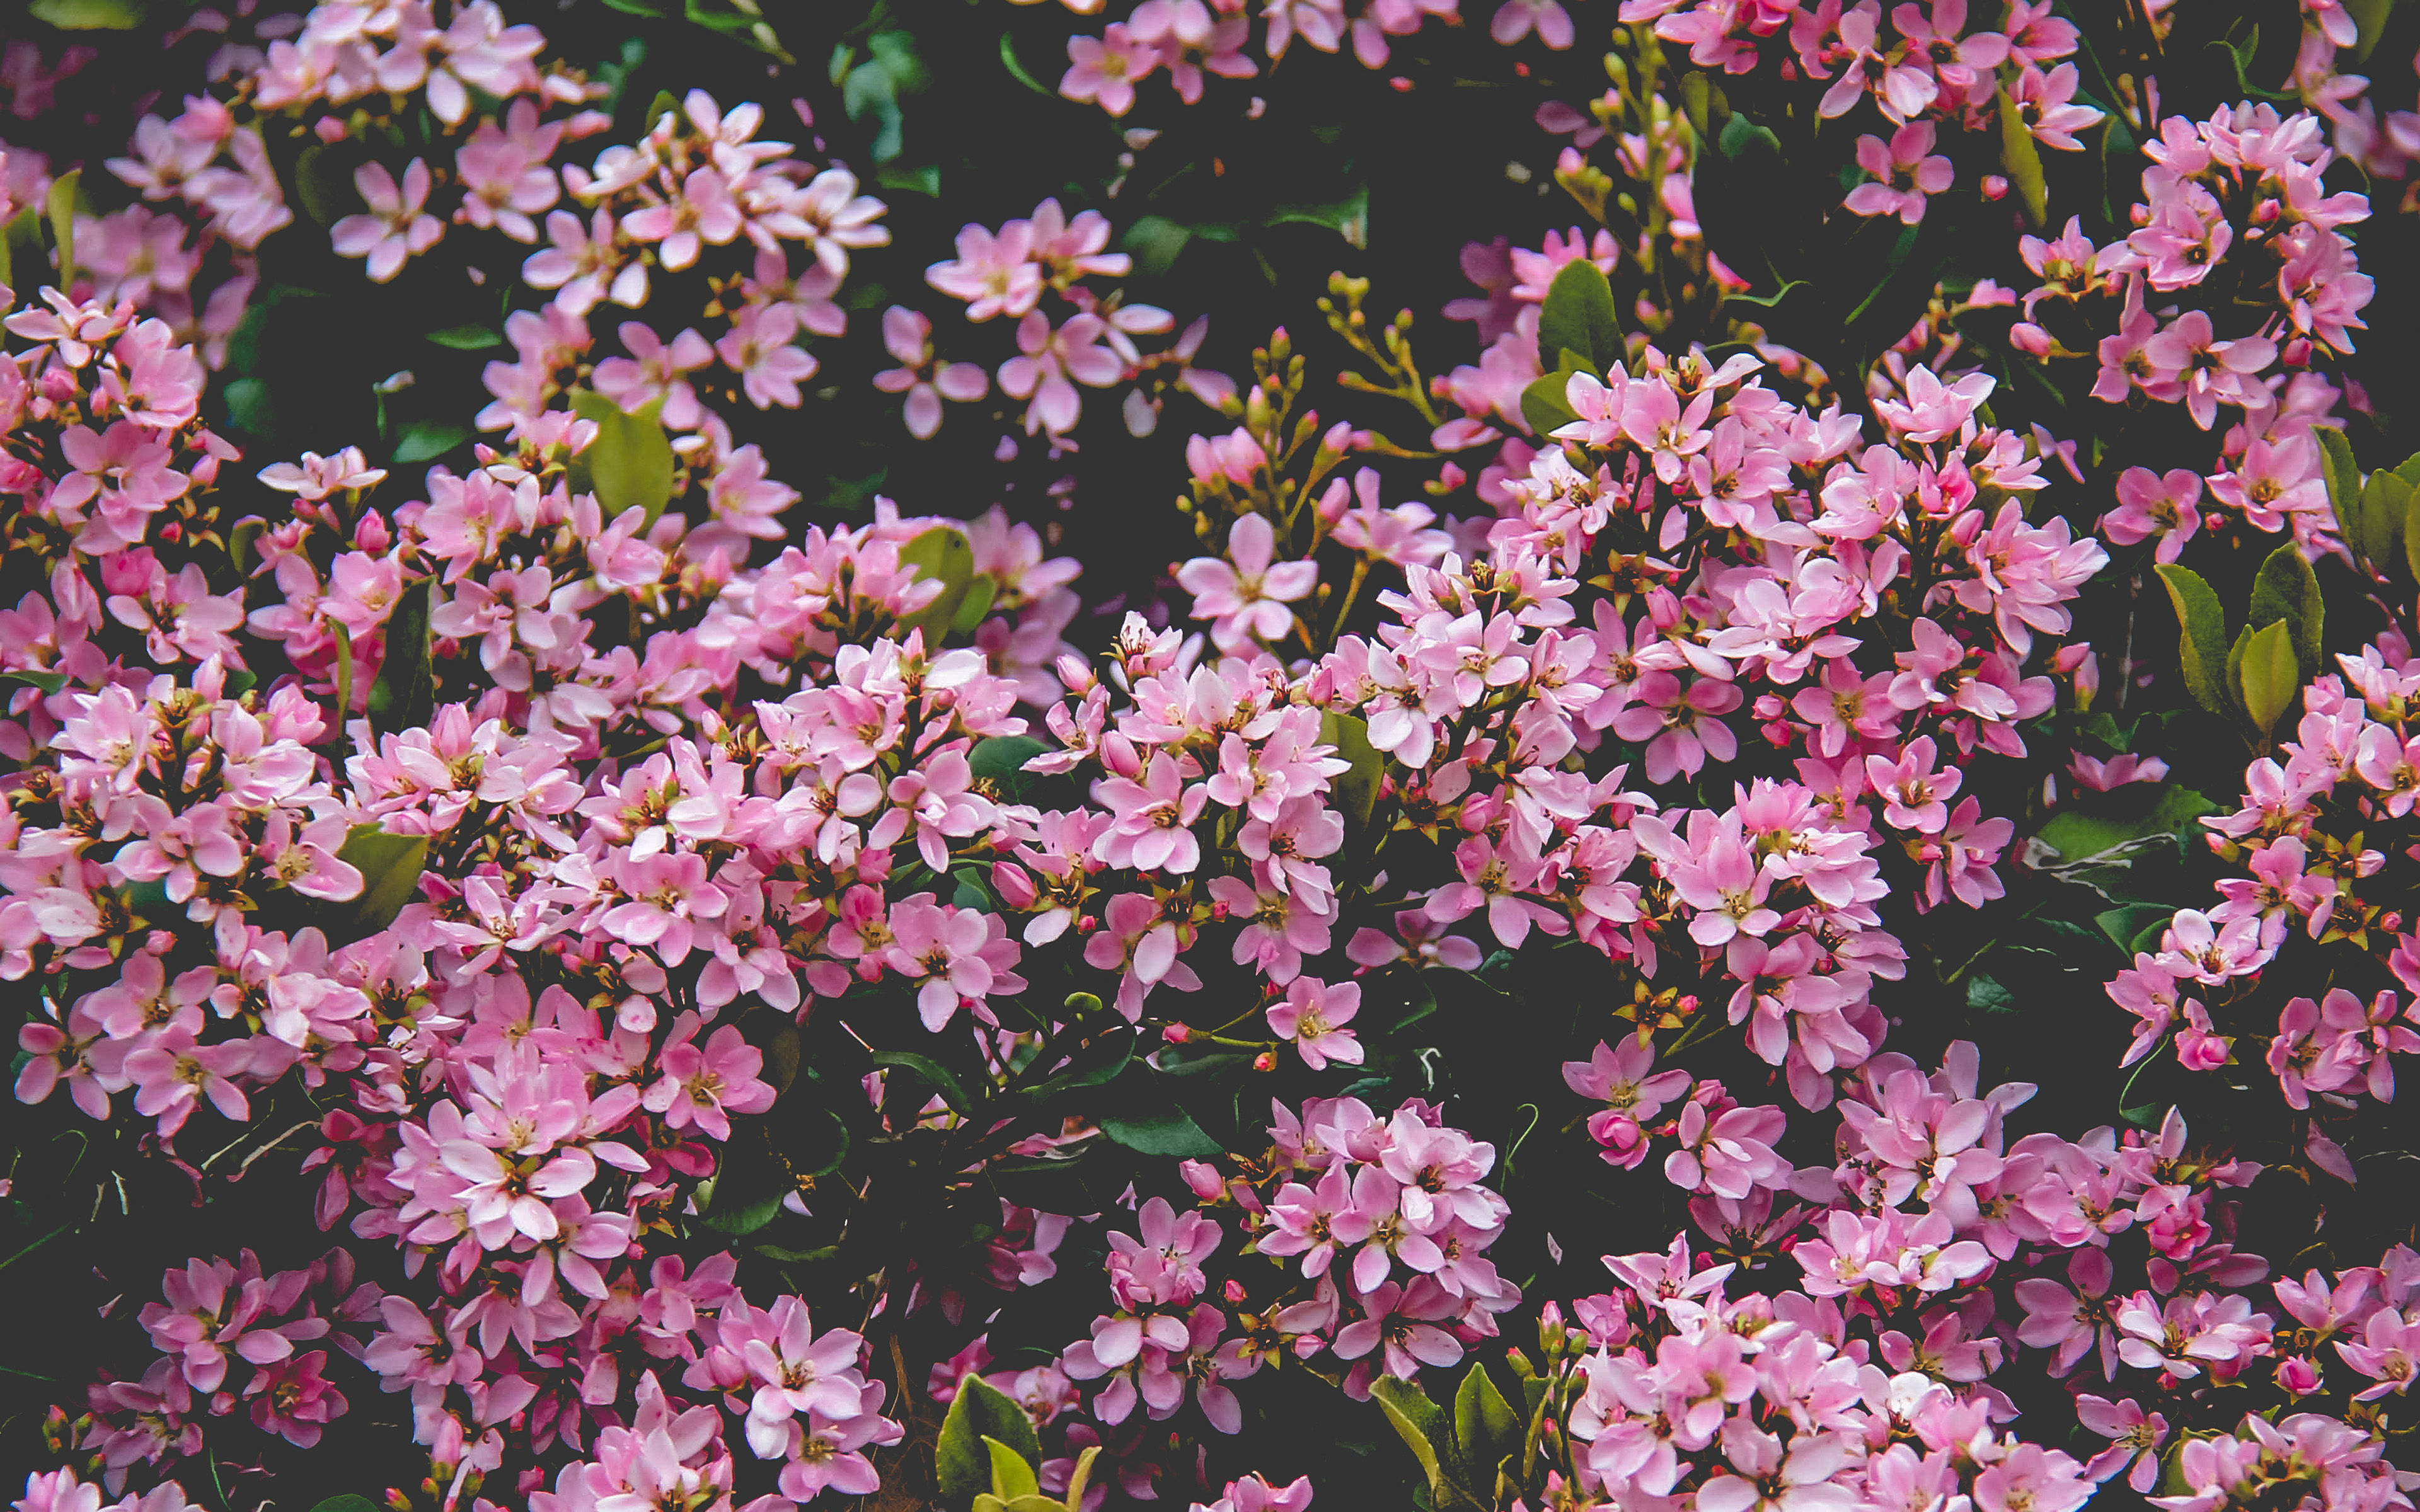 nv68-flower-pink-spring-happy-nature-wallpaper